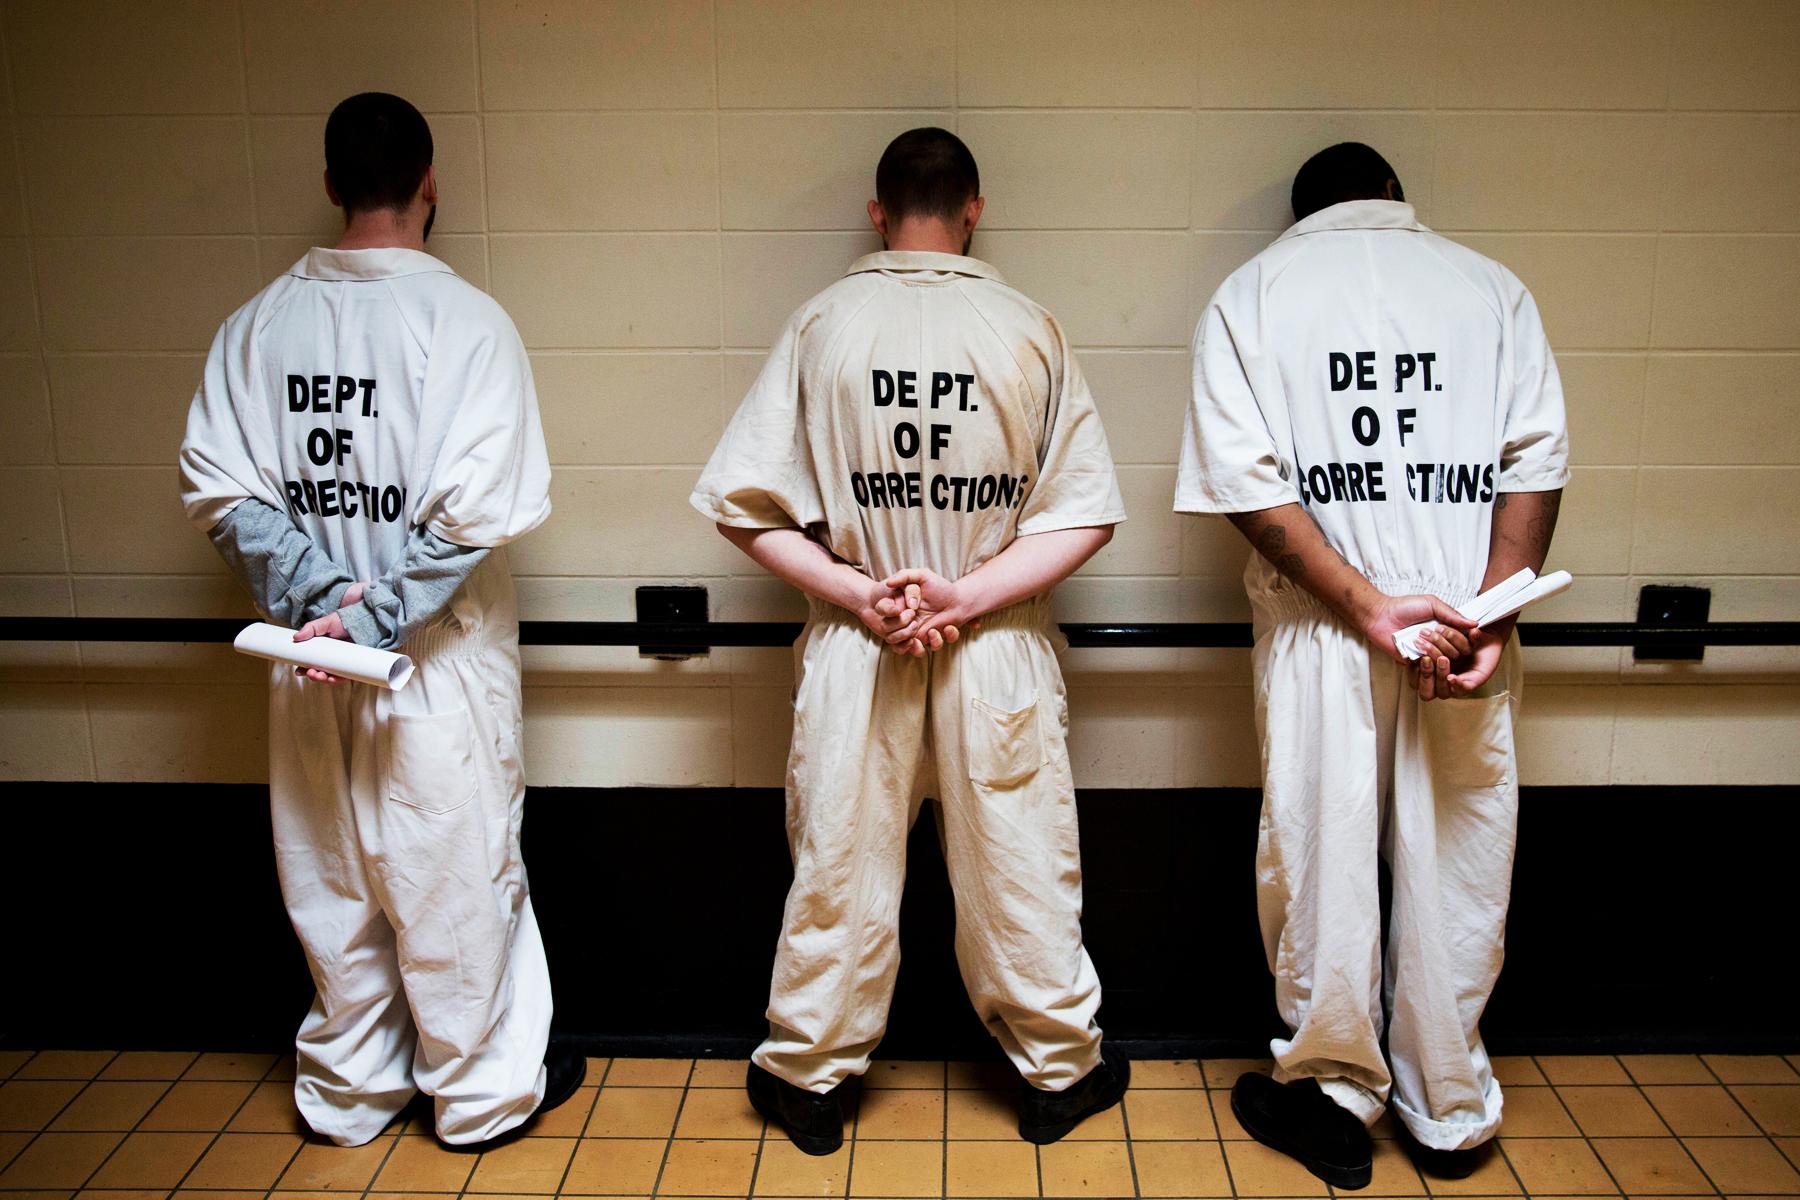 Drug Possession: United States Needs to Decriminalize Now